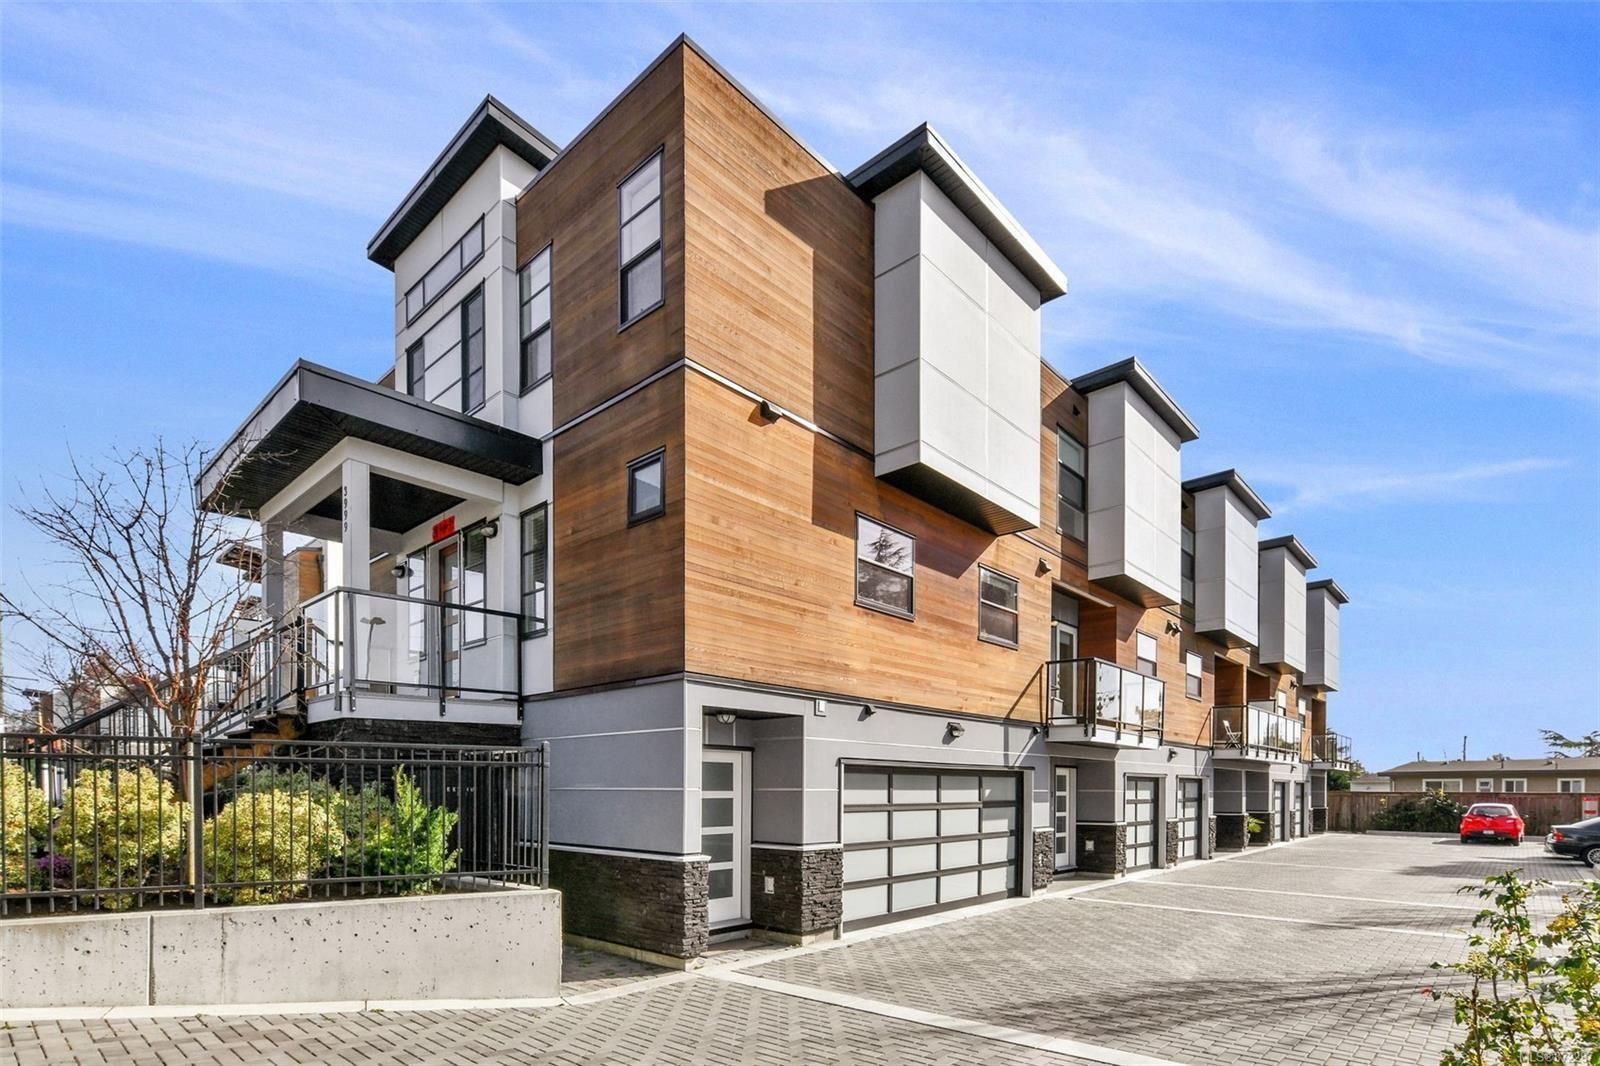 Main Photo: 2 3999 Cedar Hill Rd in : SE Cedar Hill Row/Townhouse for sale (Saanich East)  : MLS®# 872297